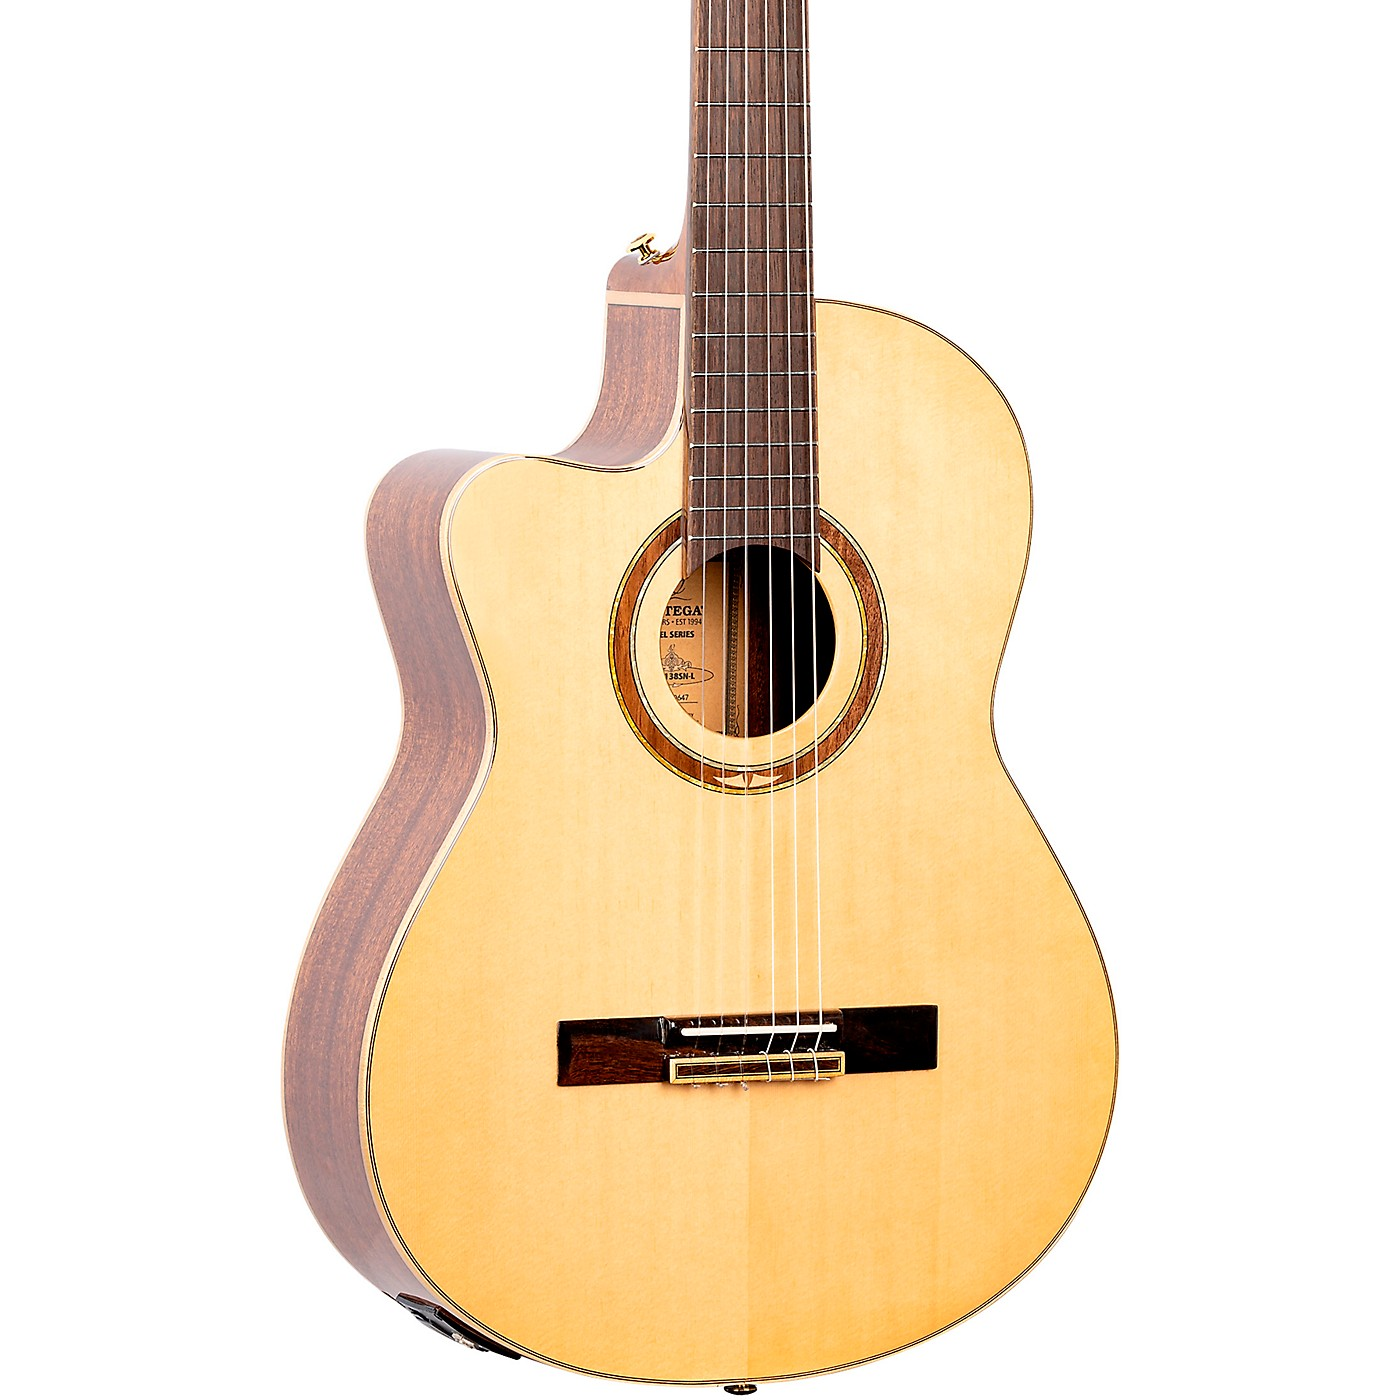 Ortega Performer Series RCE138SN-L Acoustic Electric Nylon Guitar thumbnail